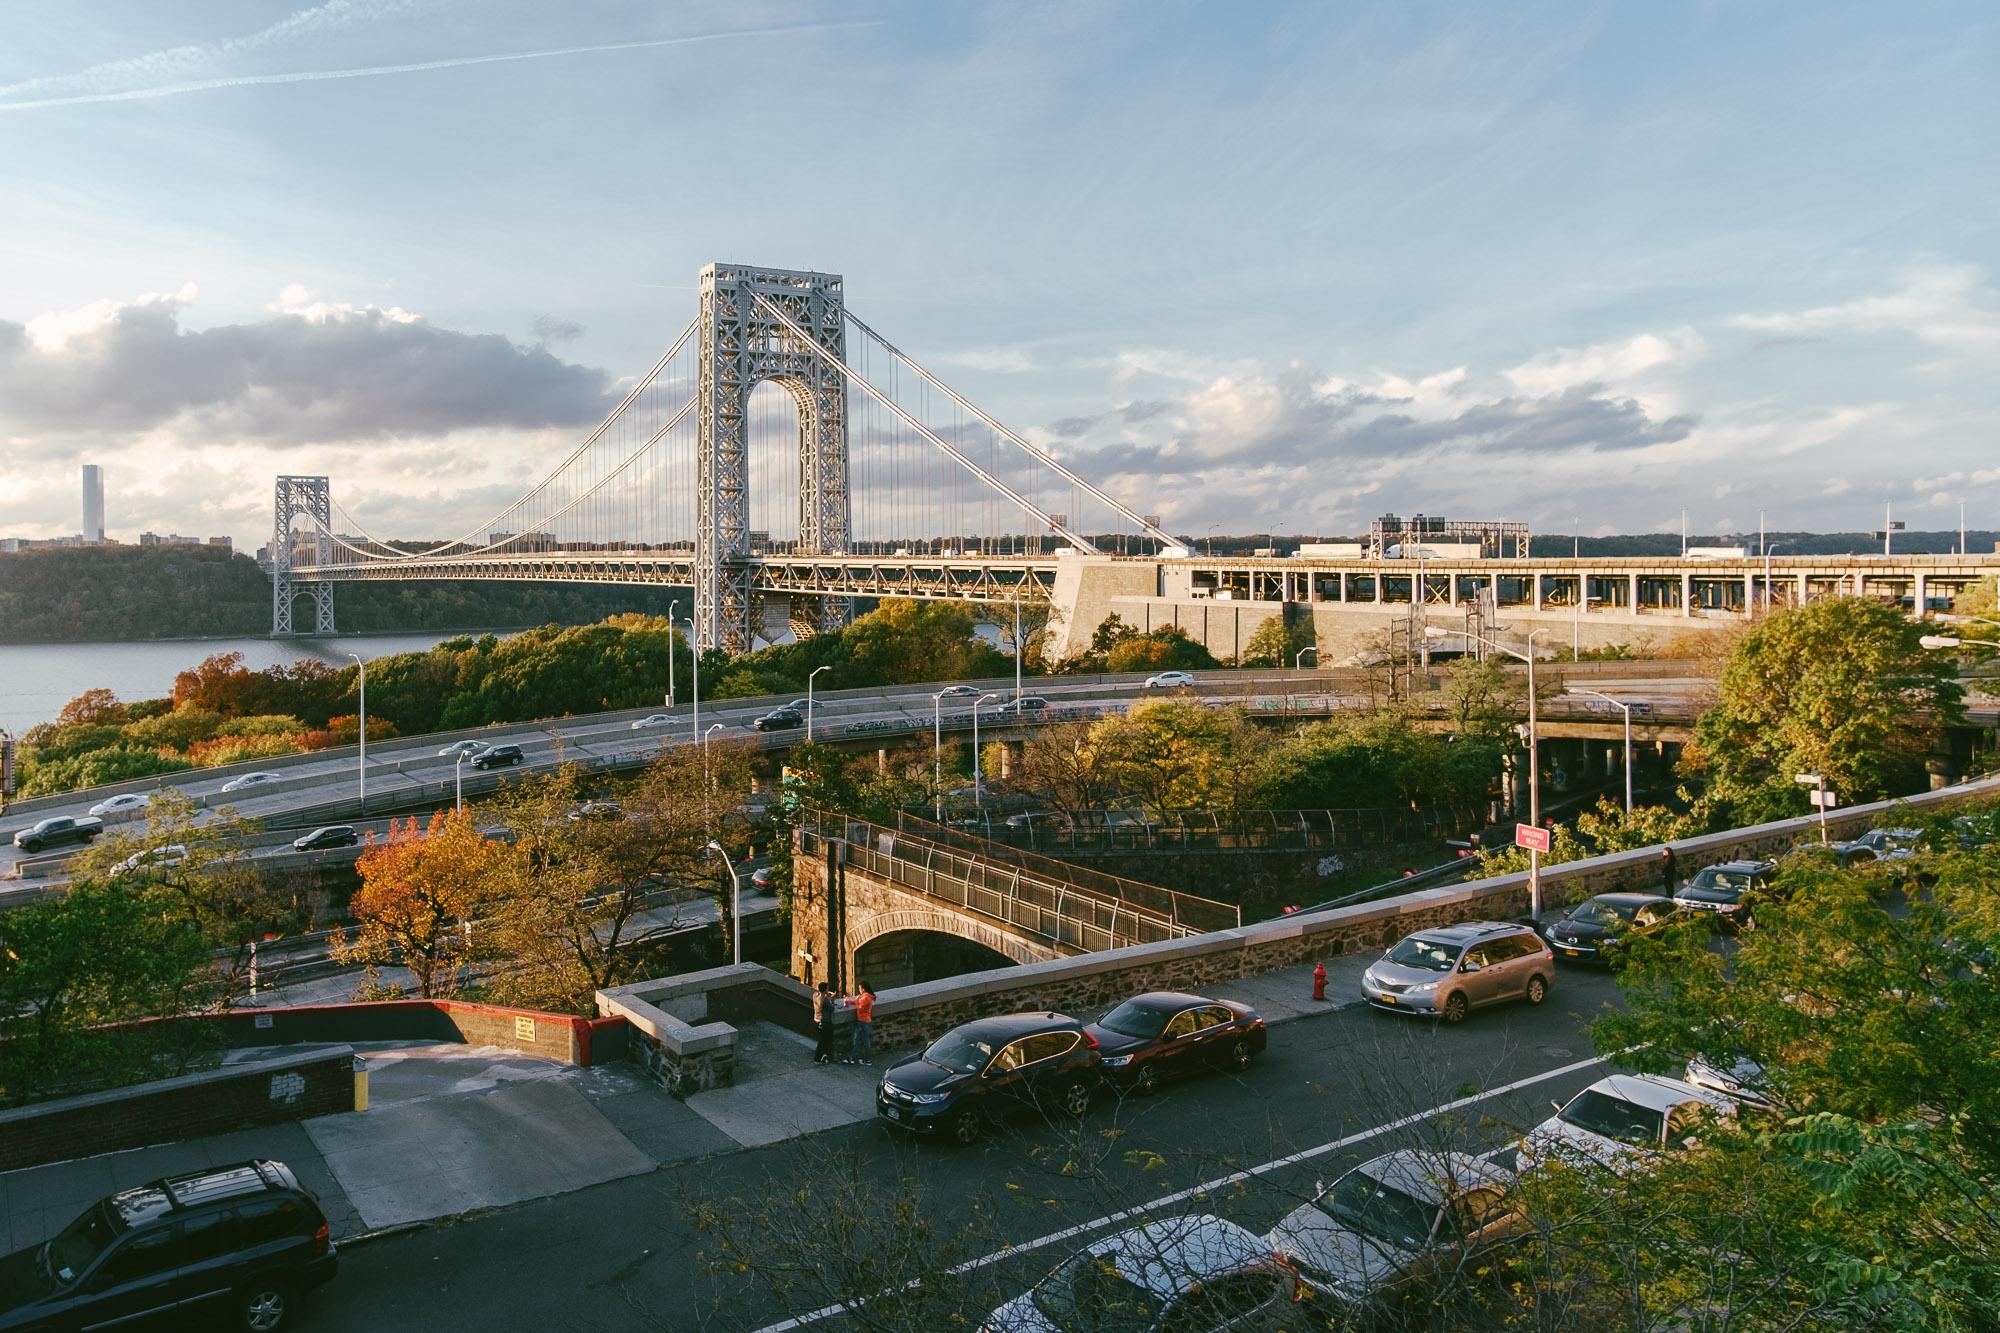 George Washington Bridge in Manhattan. Fuji X-pro1, Rokinon 12mm f/2.